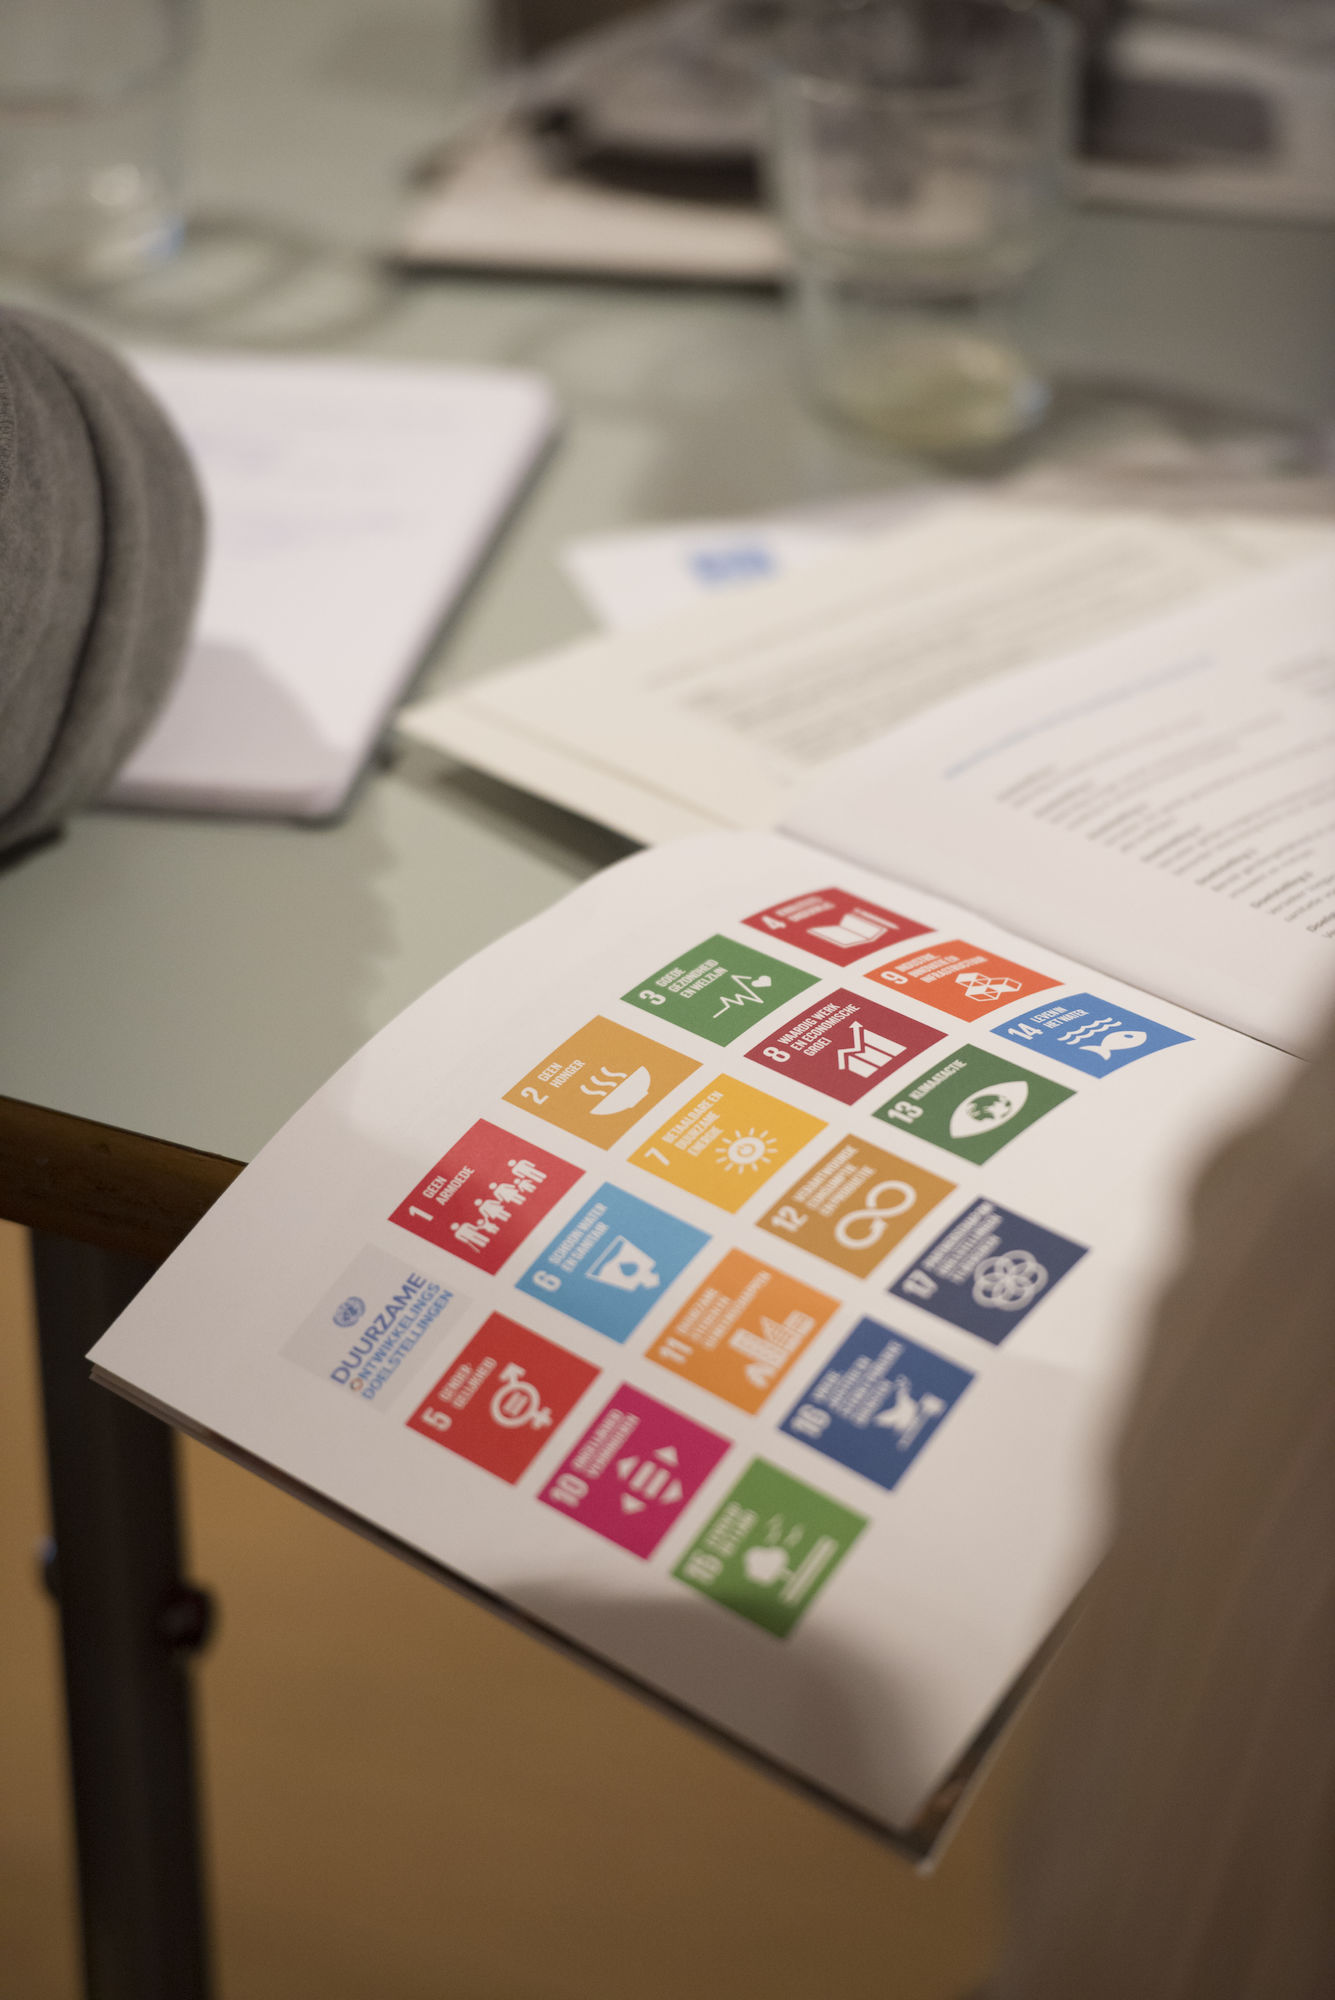 180306-SDG-workshop-00062.jpg